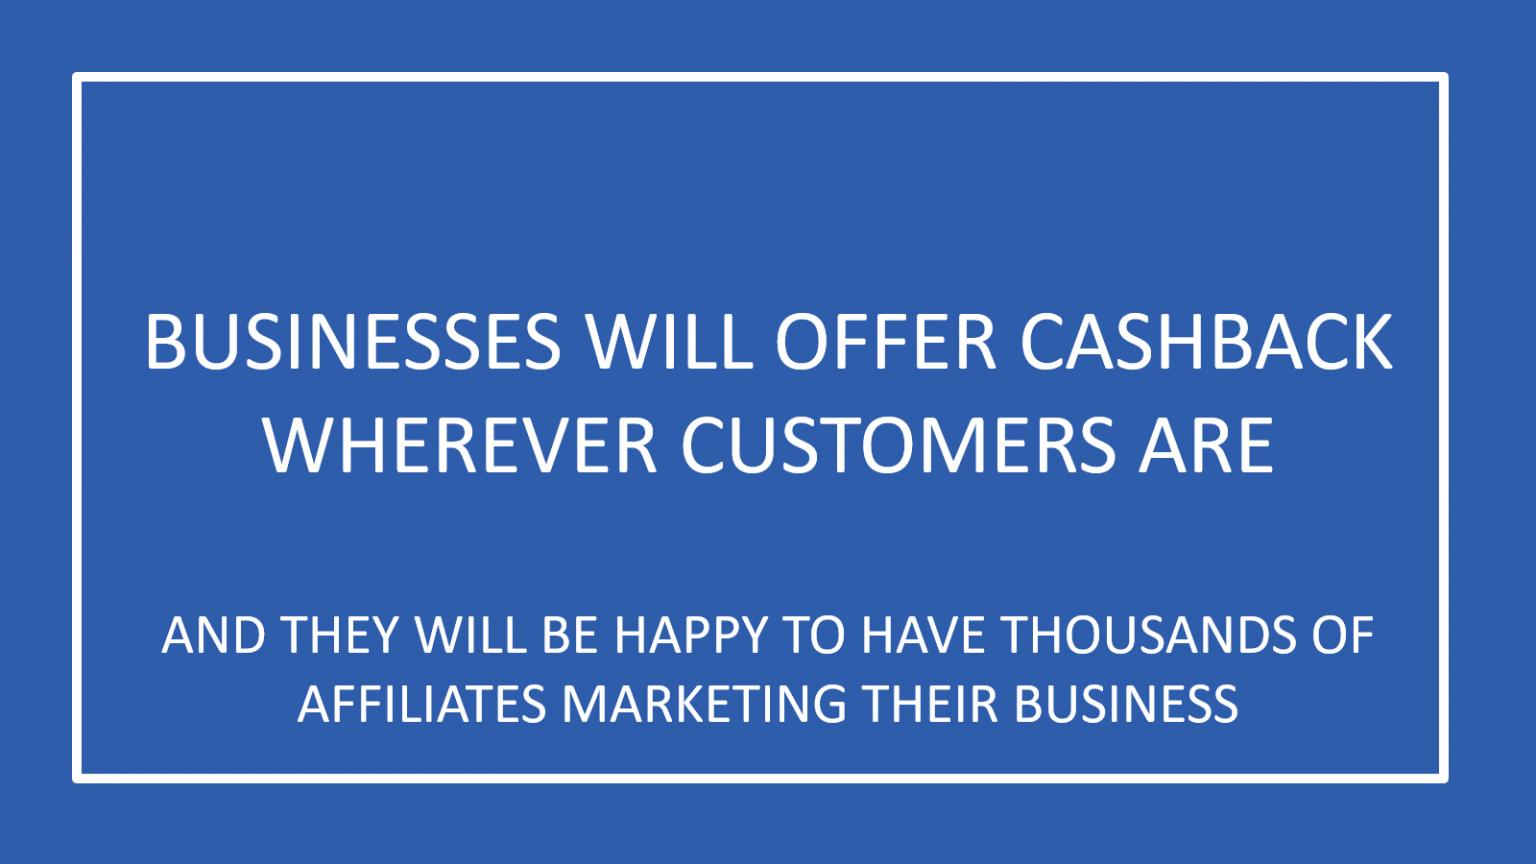 2222 - Businesses Offer Cashback - Ten10